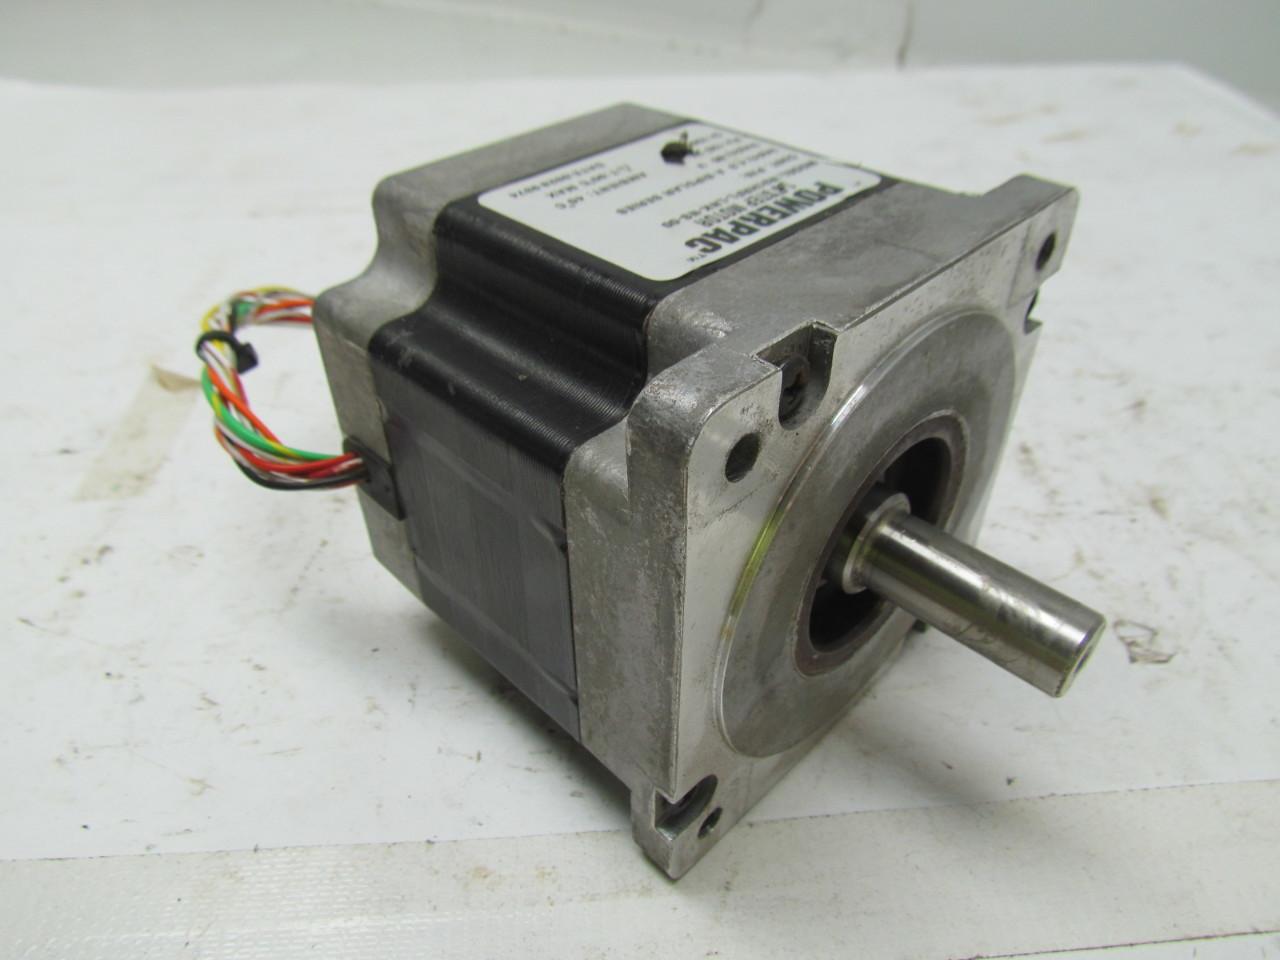 Pacific Scientific N31hrfl Lnk Ns 00 Powerpac 1 8 Step Motor Bipolar Series Ebay